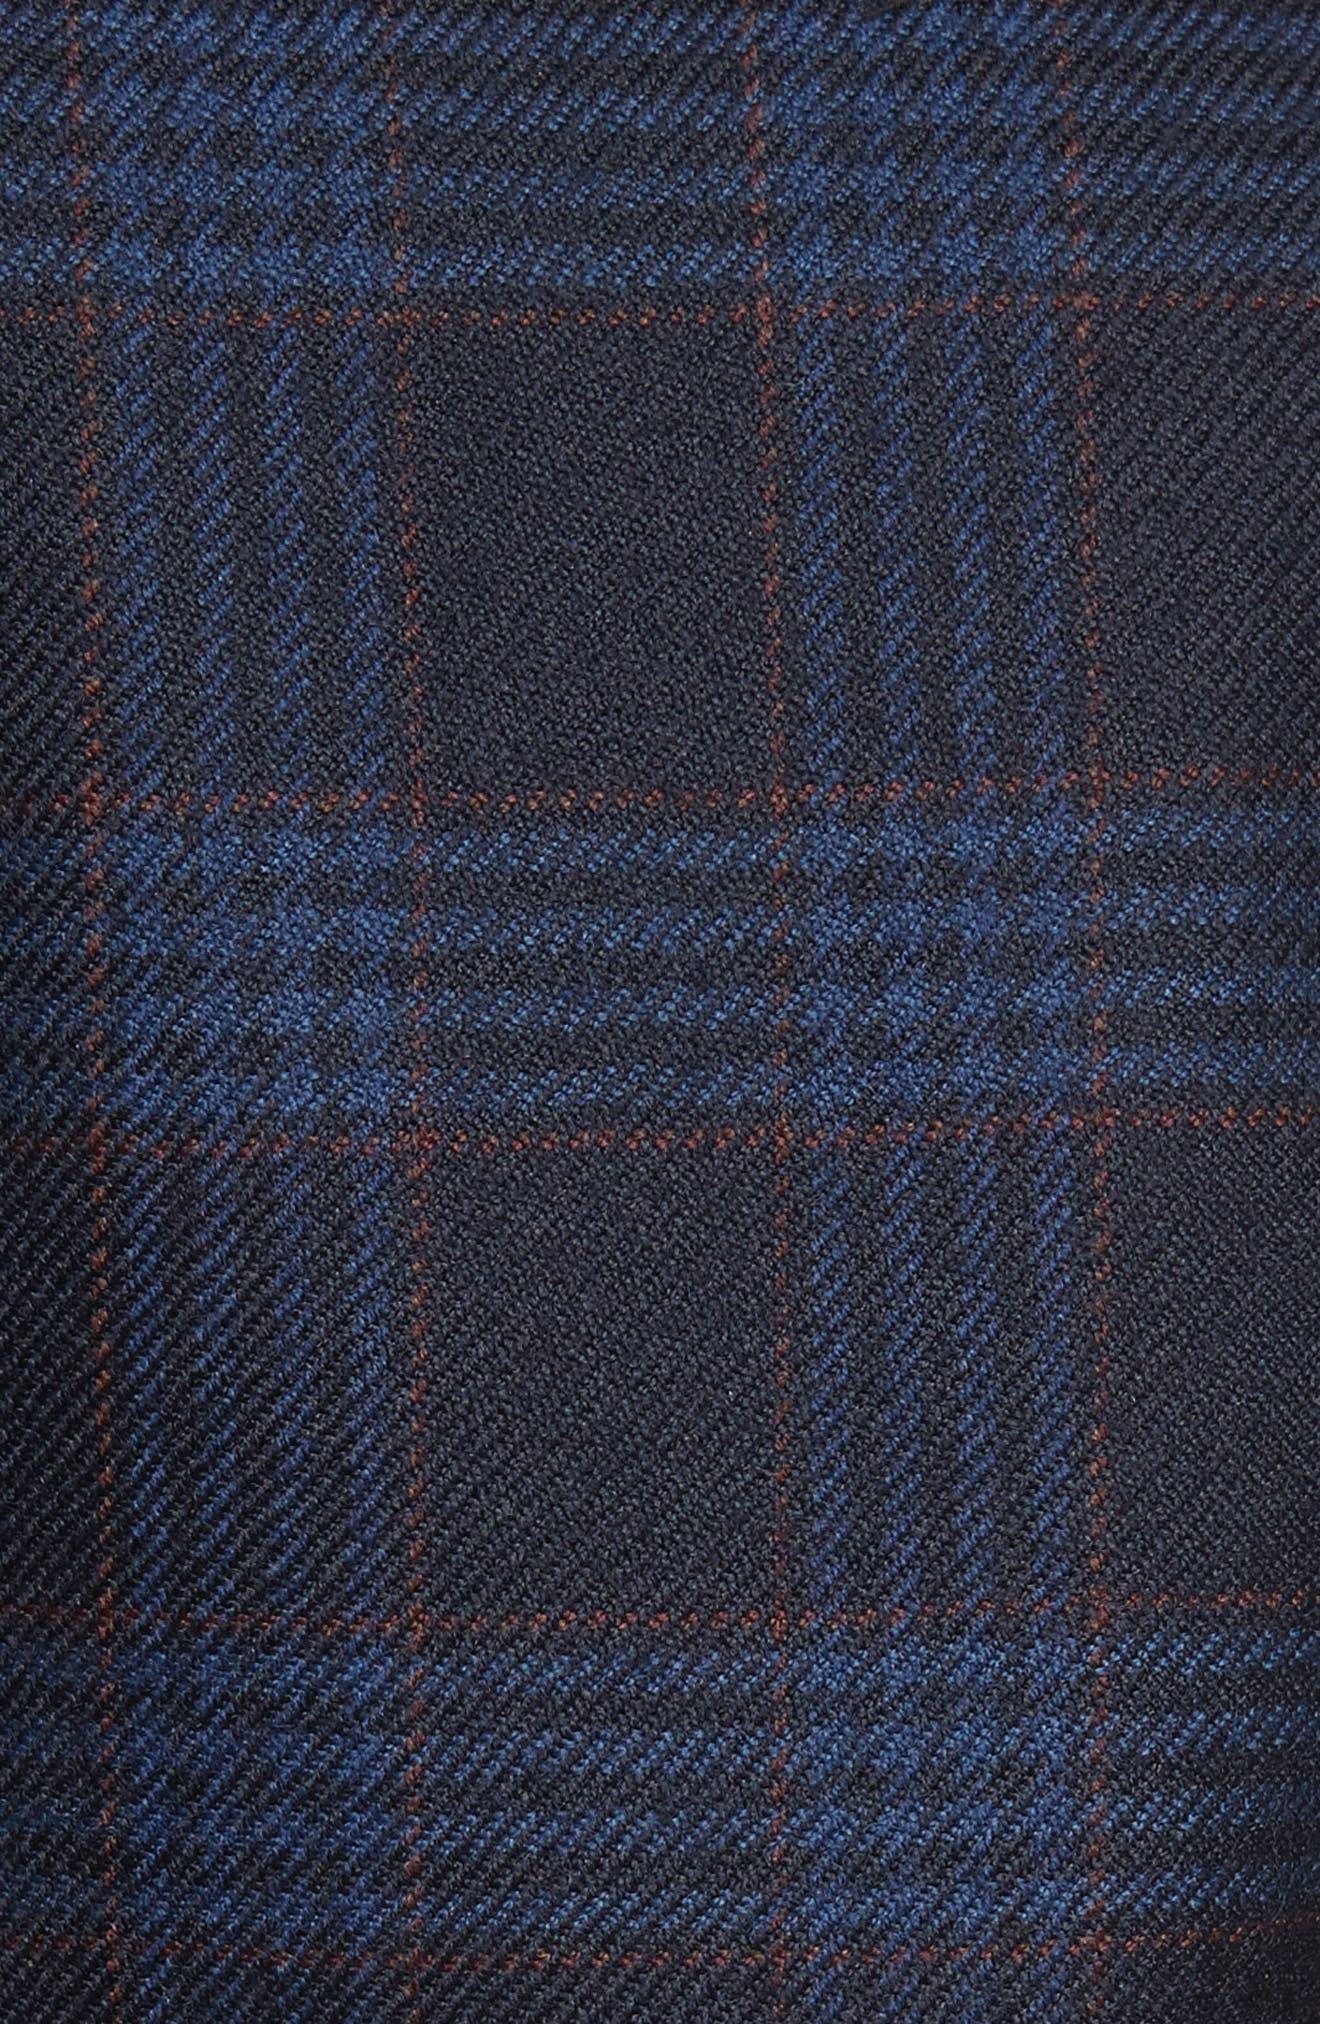 Rafferty Oversize Plaid Blazer,                             Alternate thumbnail 5, color,                             402